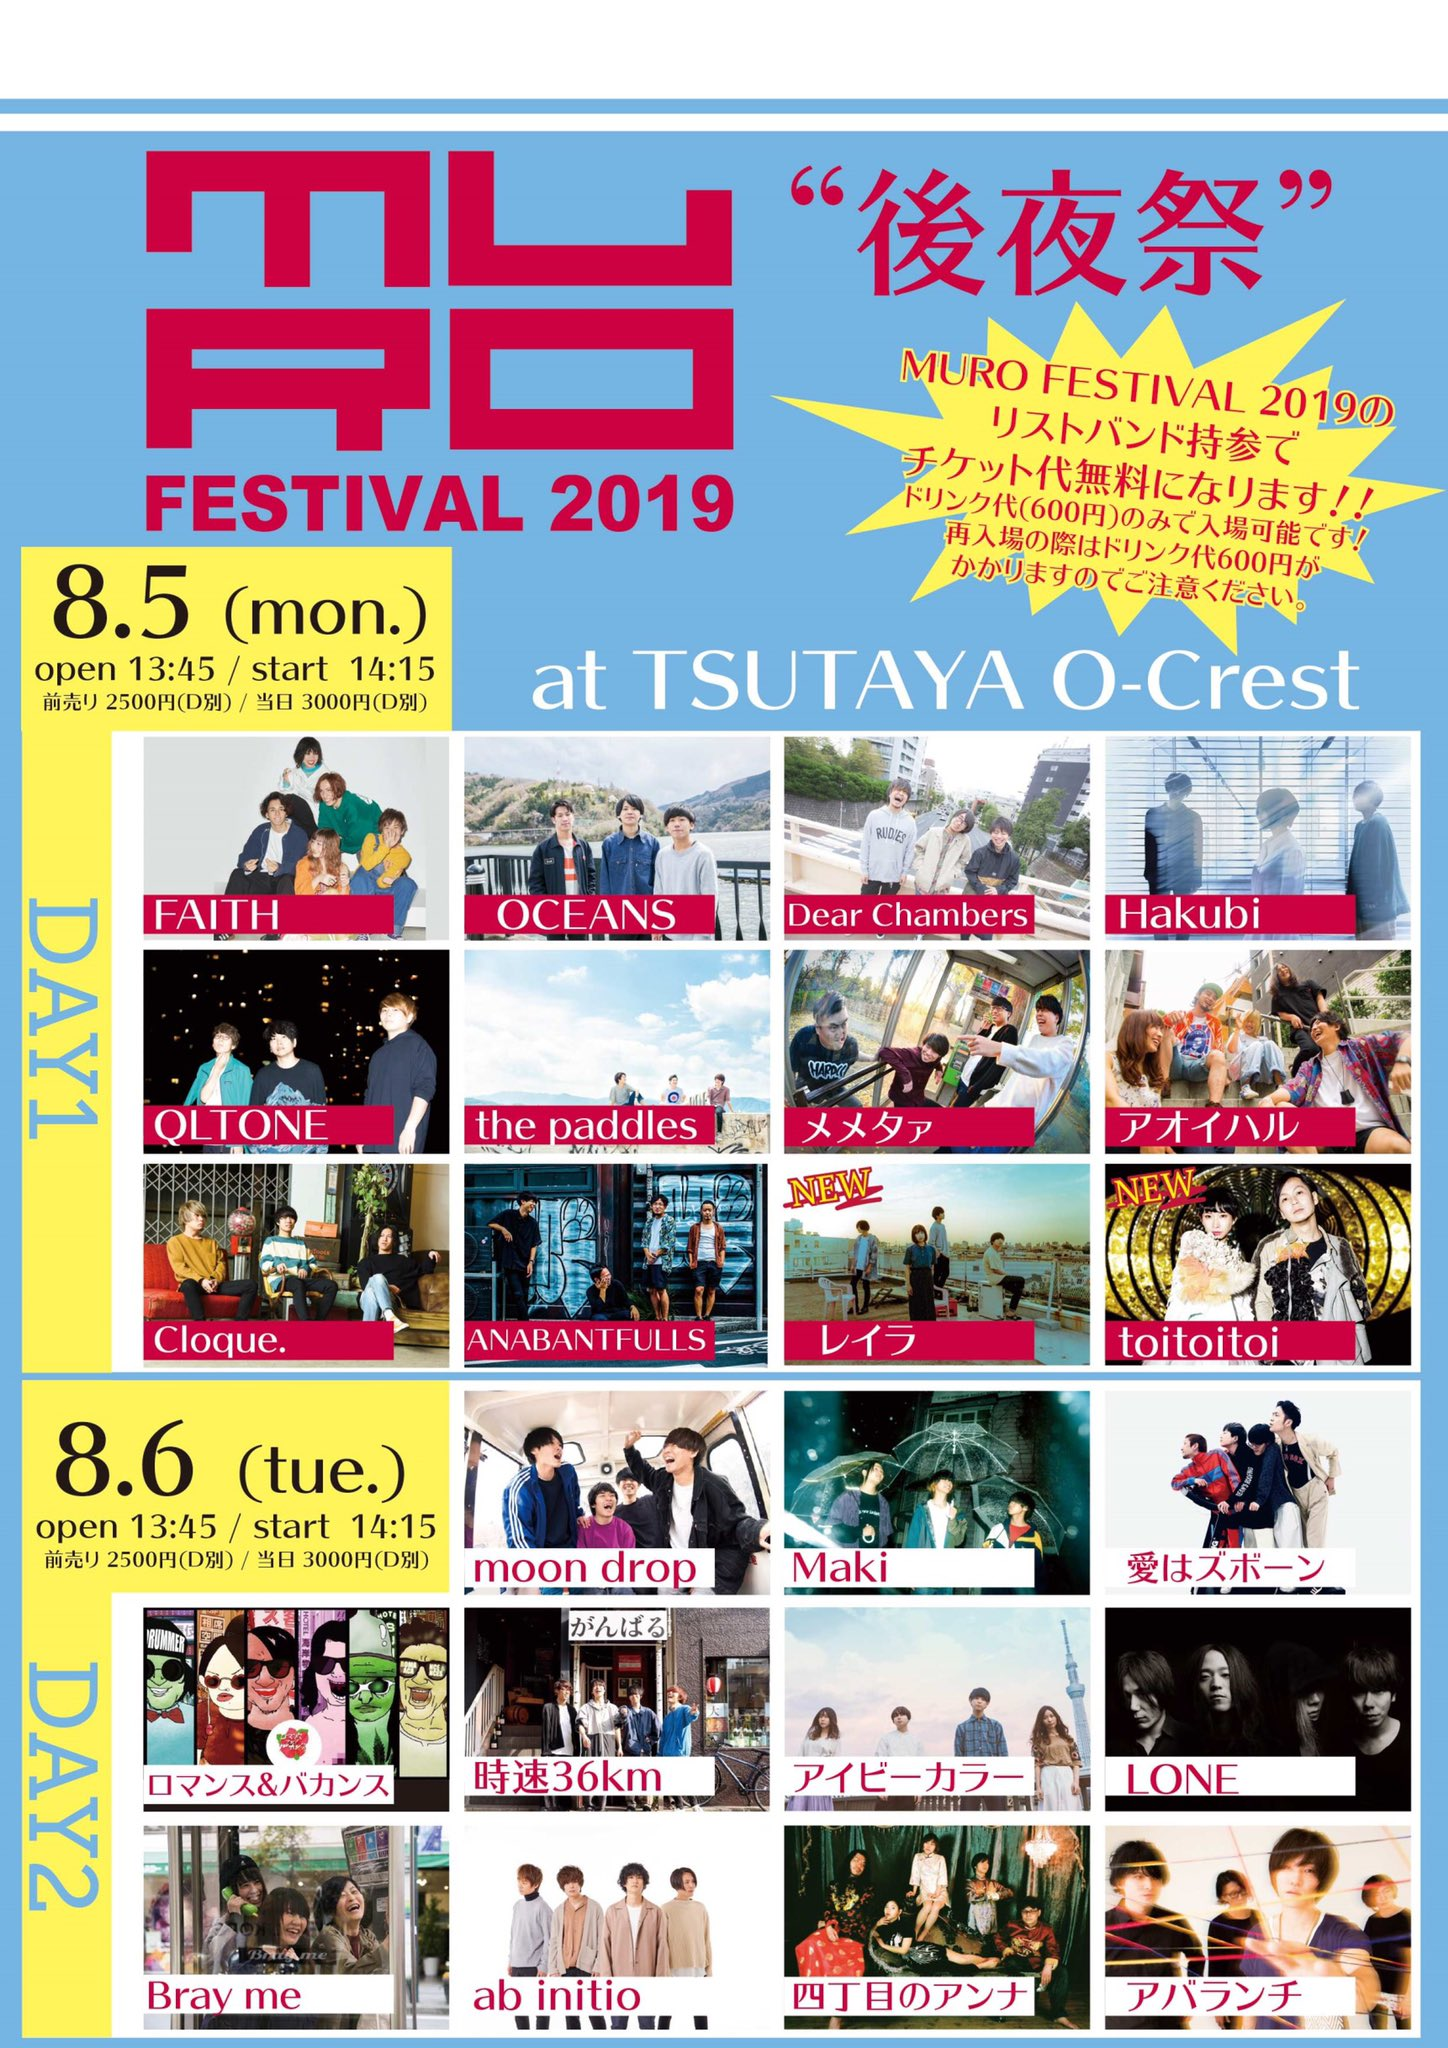 "『MURO FESTIVAL 2019″後夜祭""』"